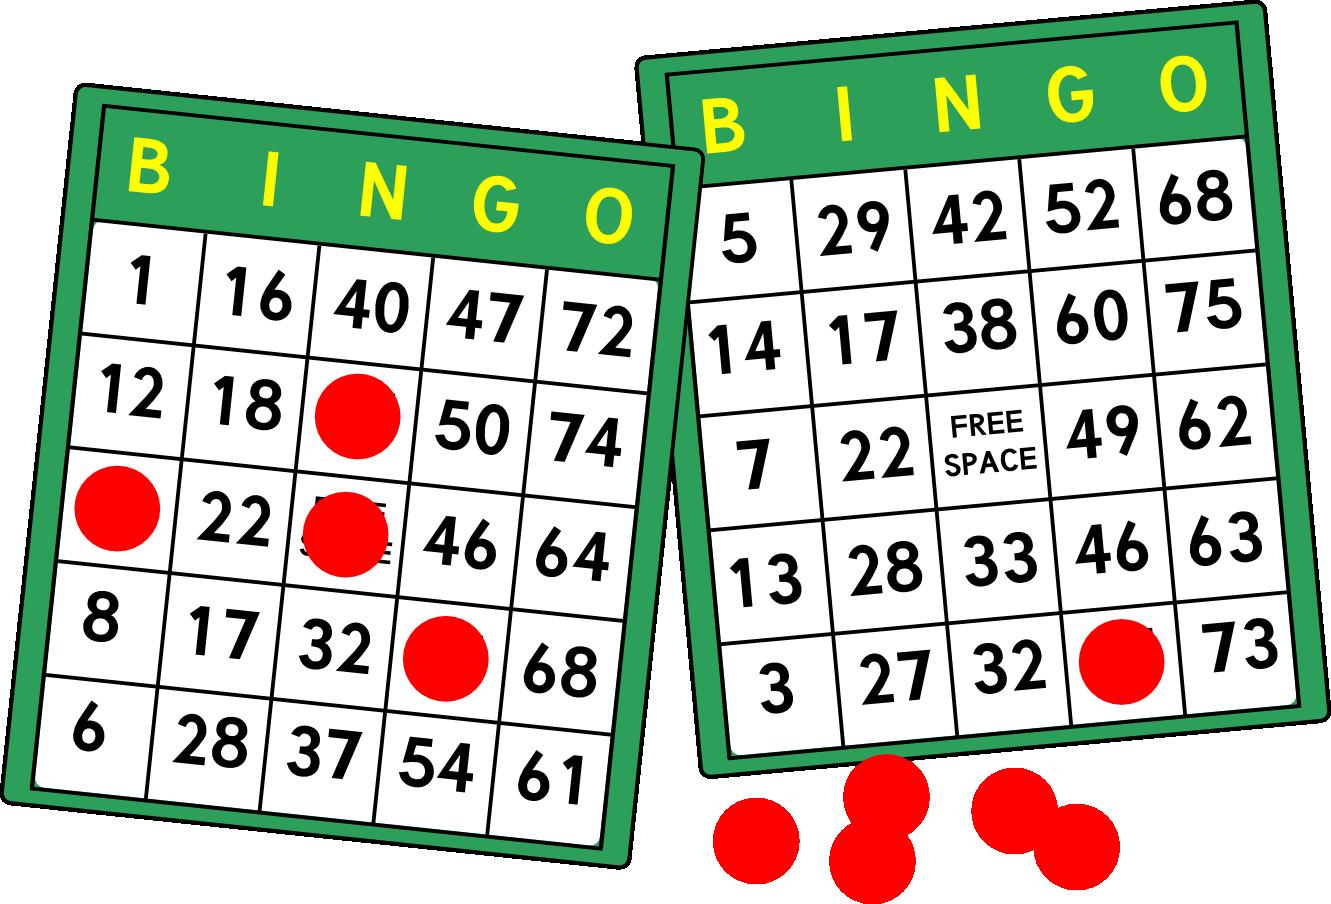 Panda free images bingoclipart. Bingo clipart line